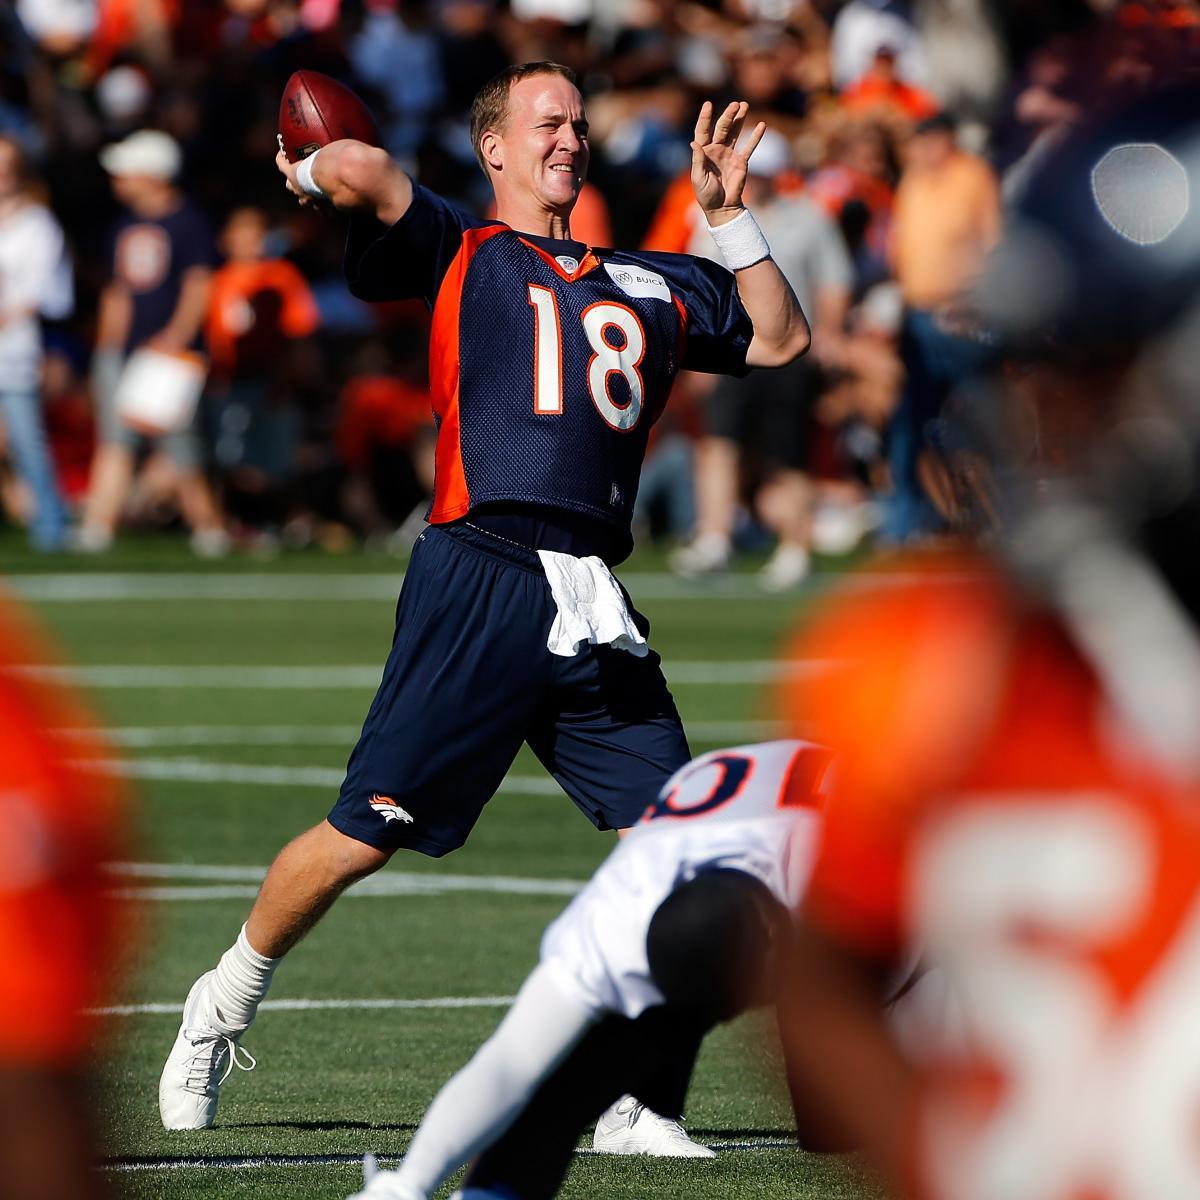 Denver Broncos Roster 2012: Latest News, Cuts, Preseason